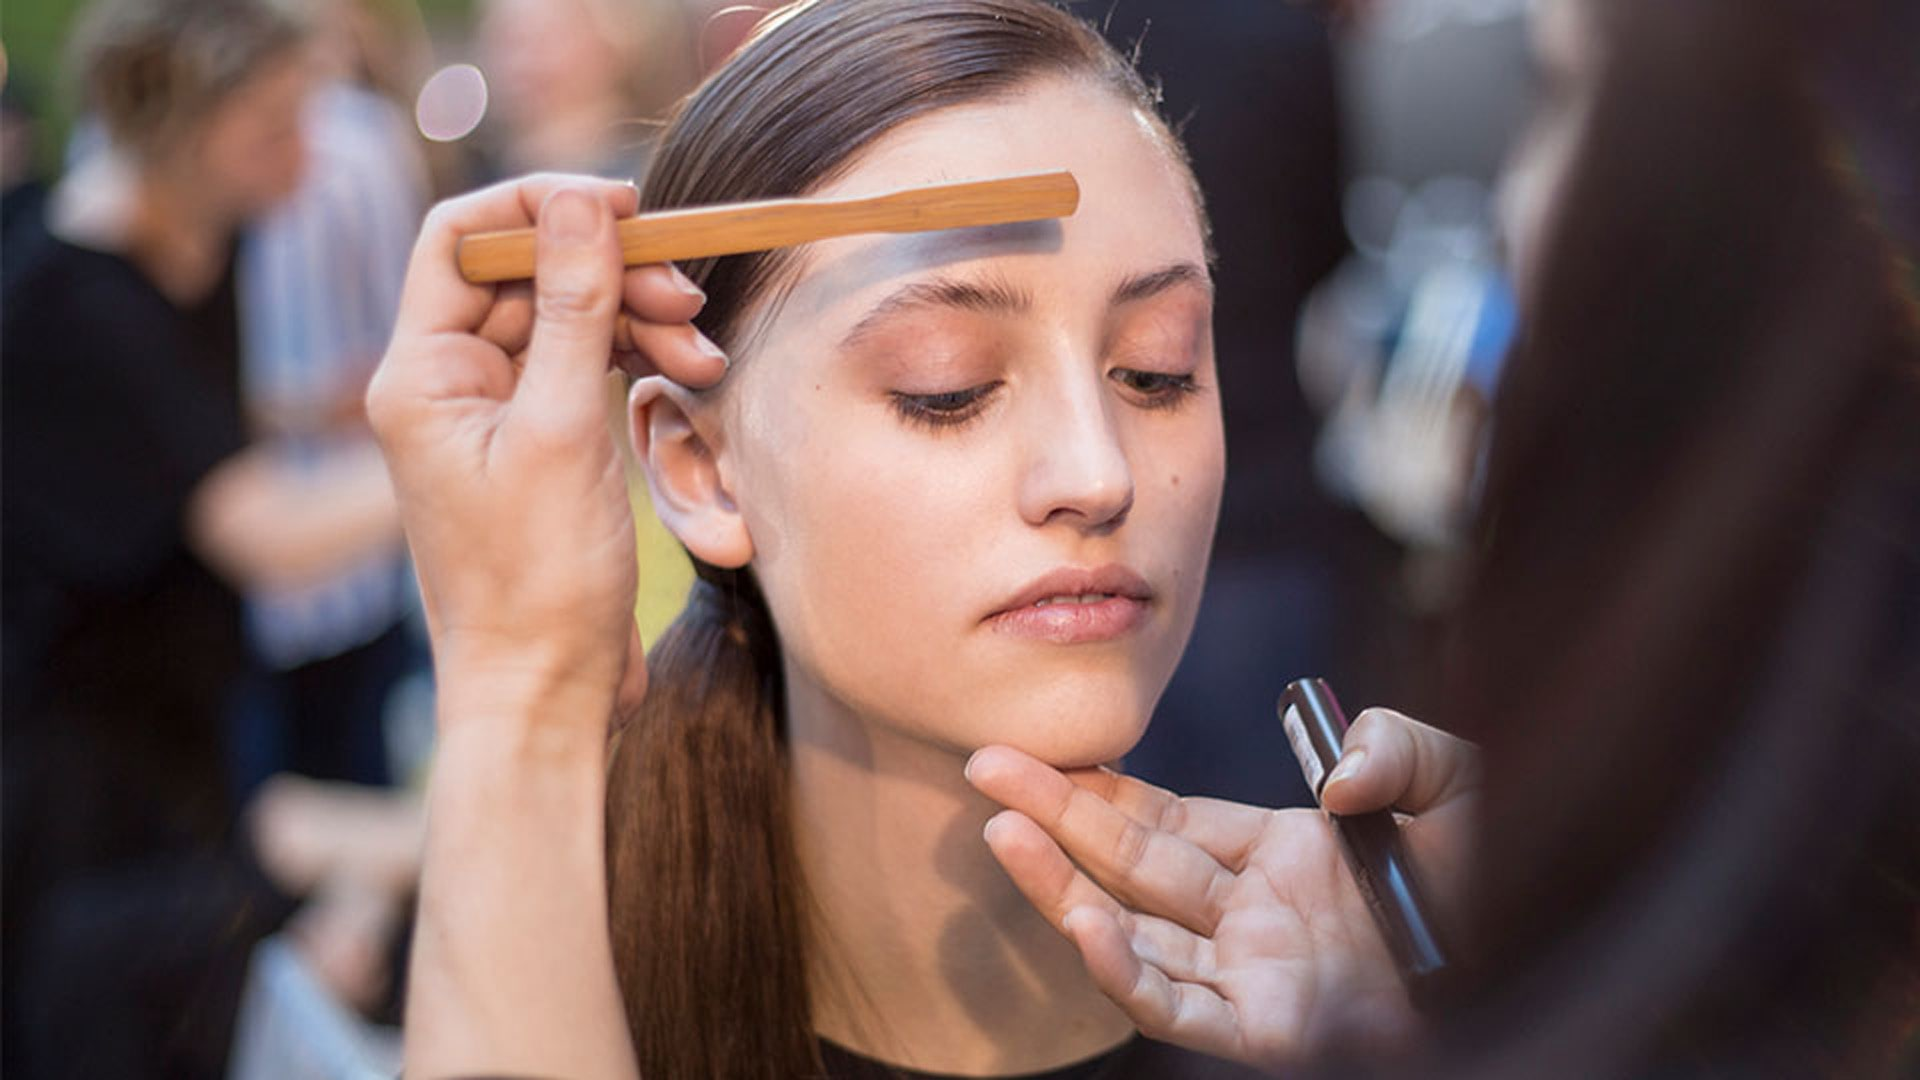 Makeup Artists' Best Under-the-Radar BeautyHacks